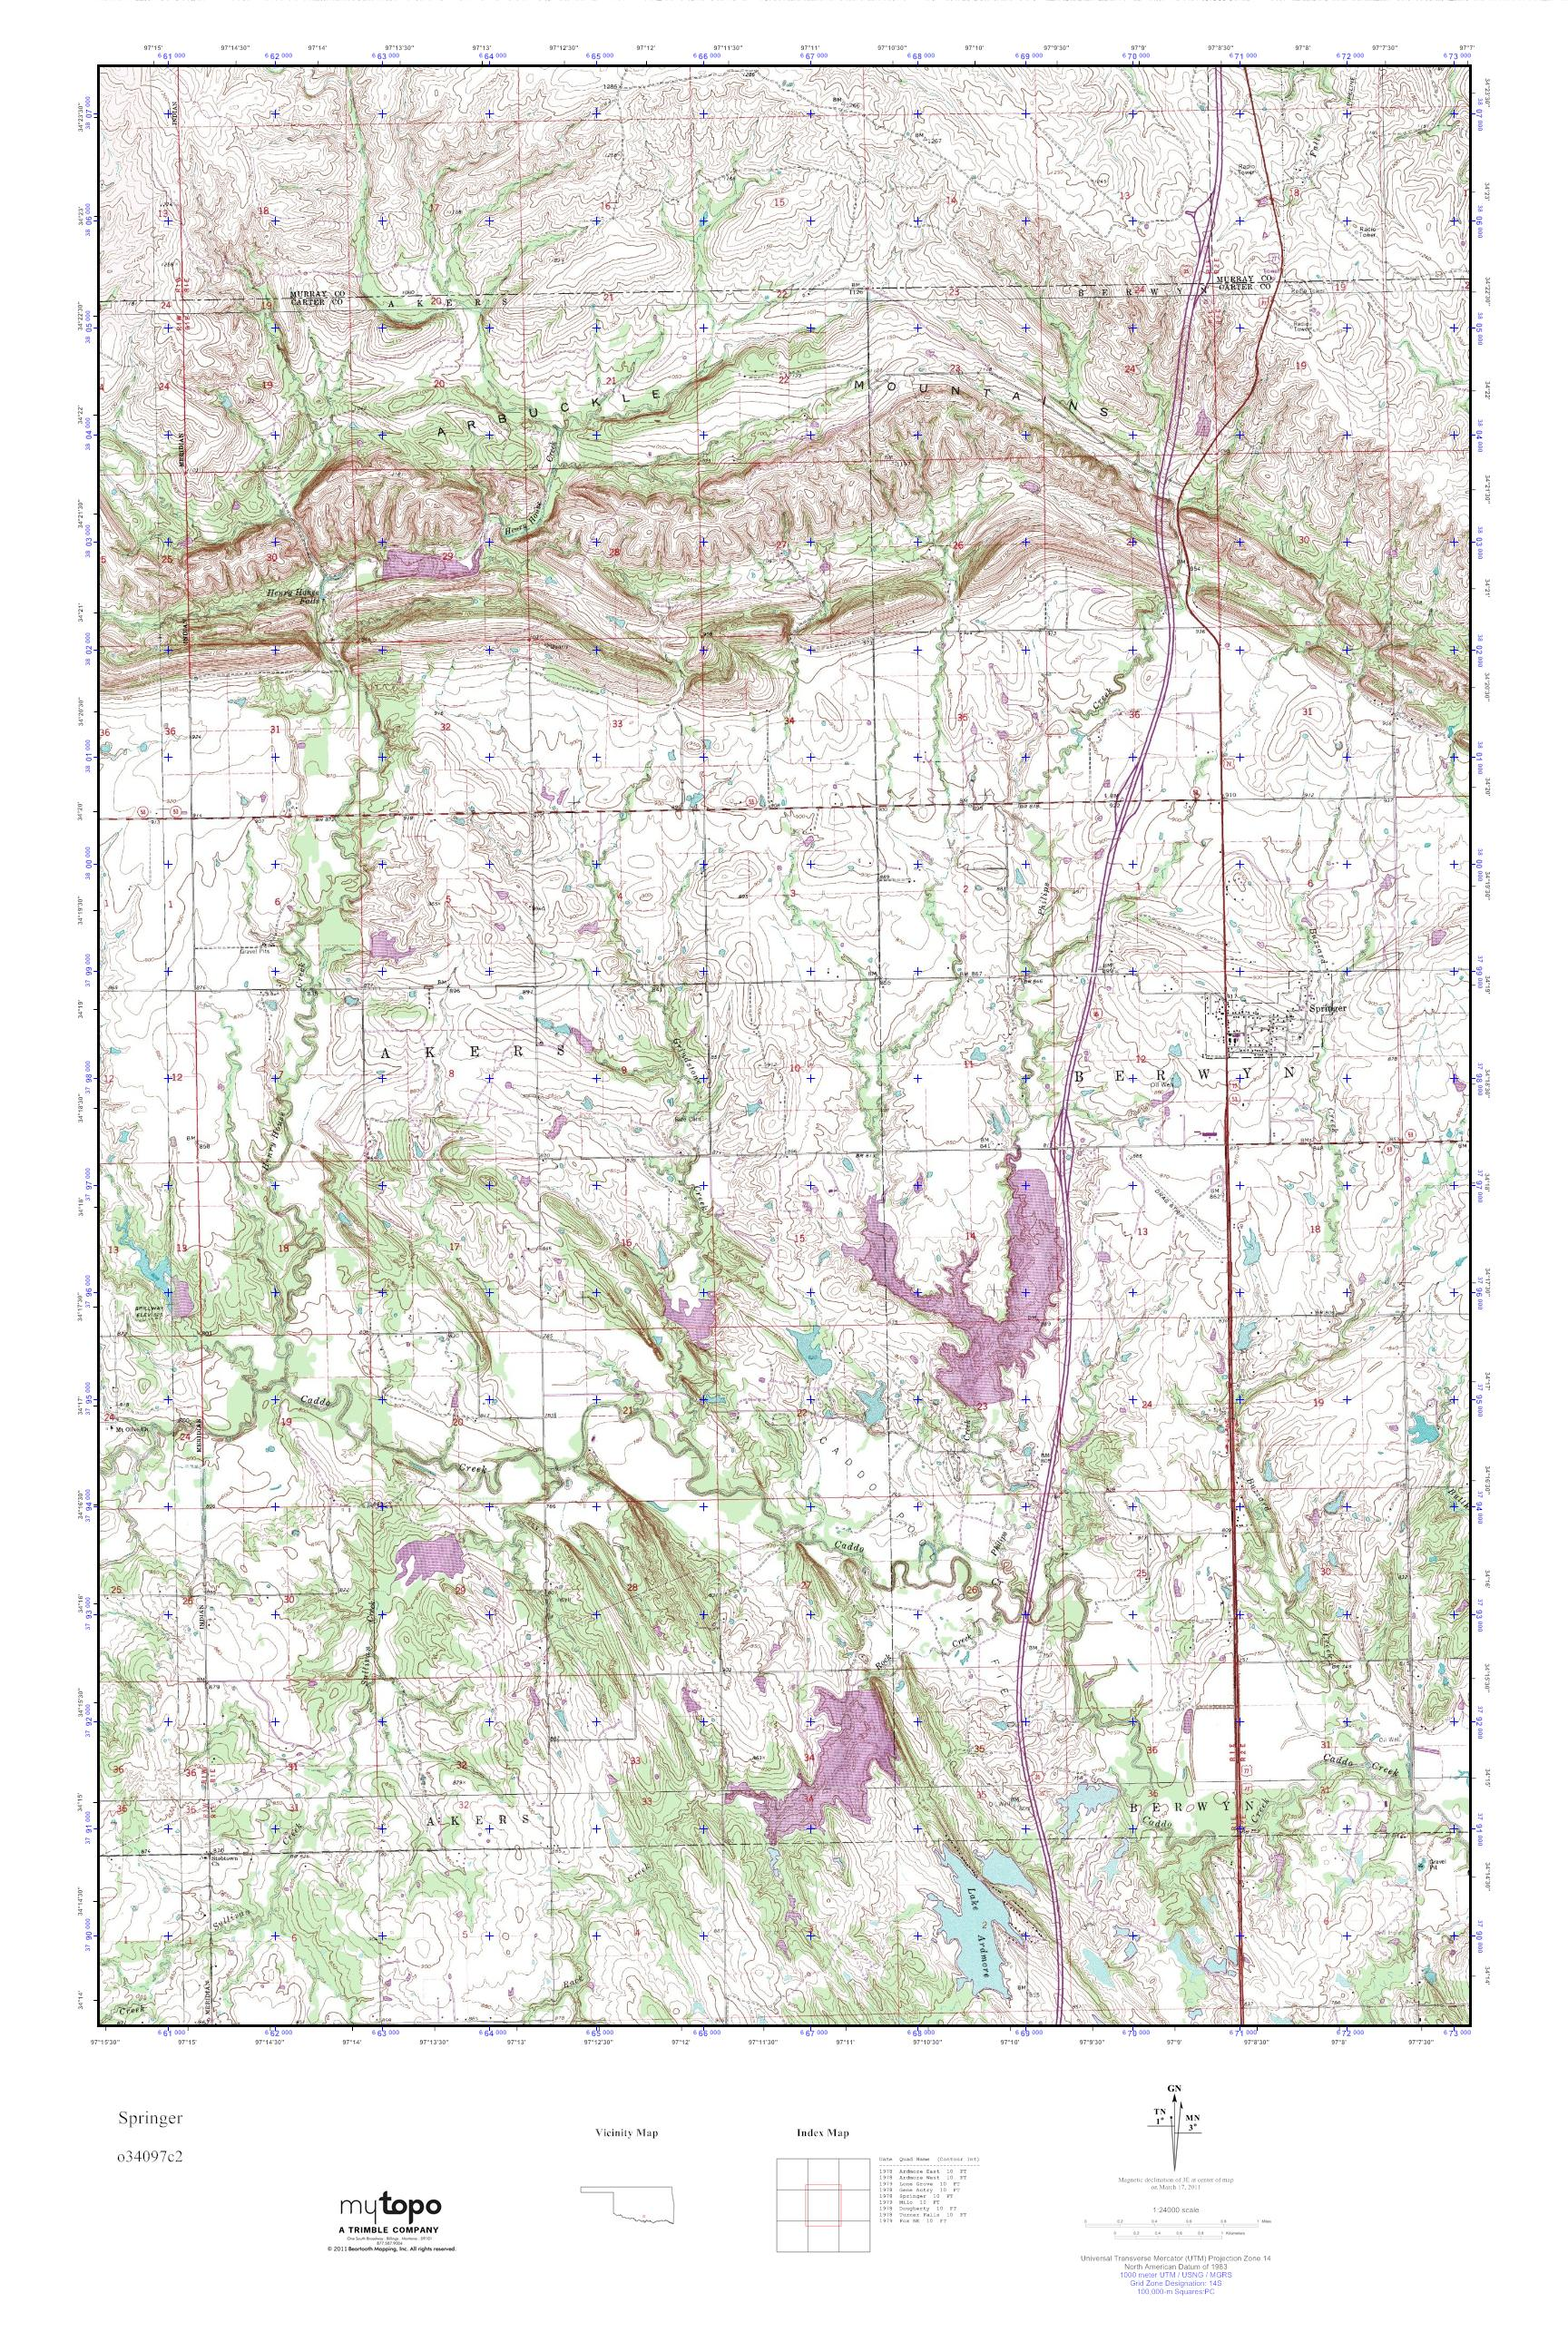 Mytopo Springer Oklahoma Usgs Quad Topo Map